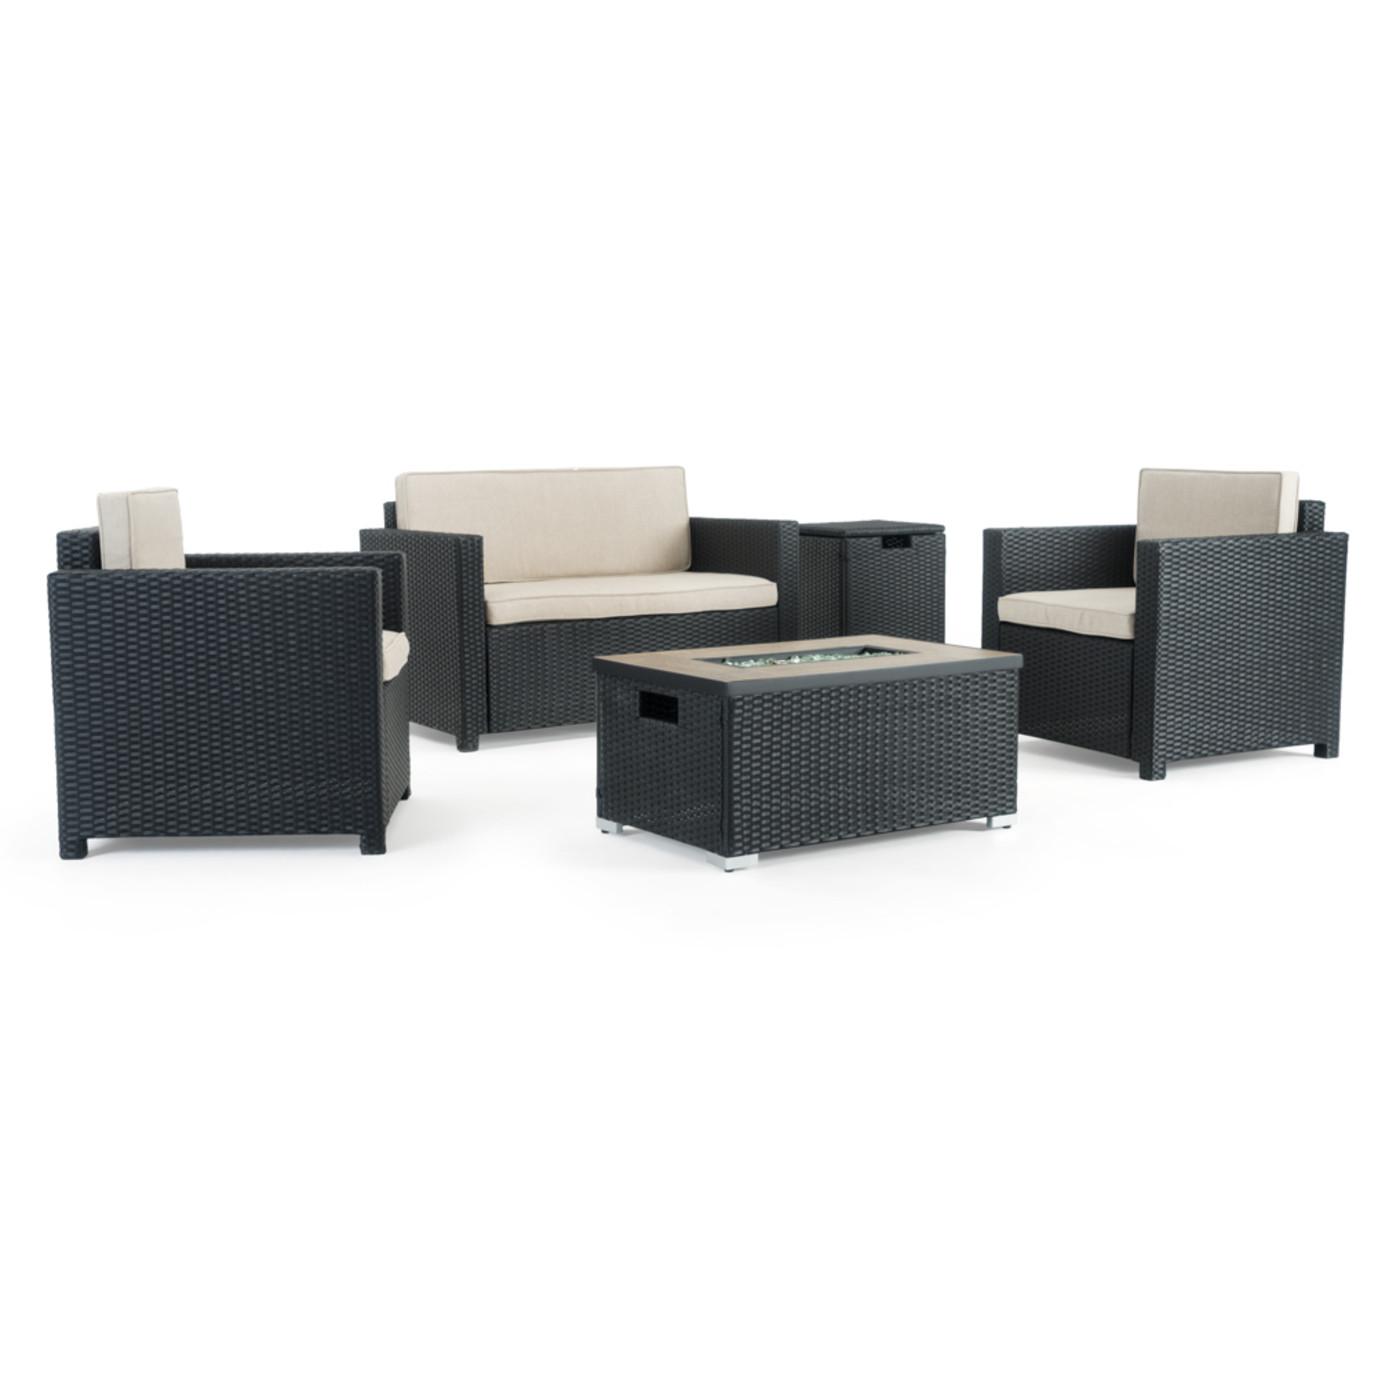 Boulder 4 Piece Fire Seating Set - Black